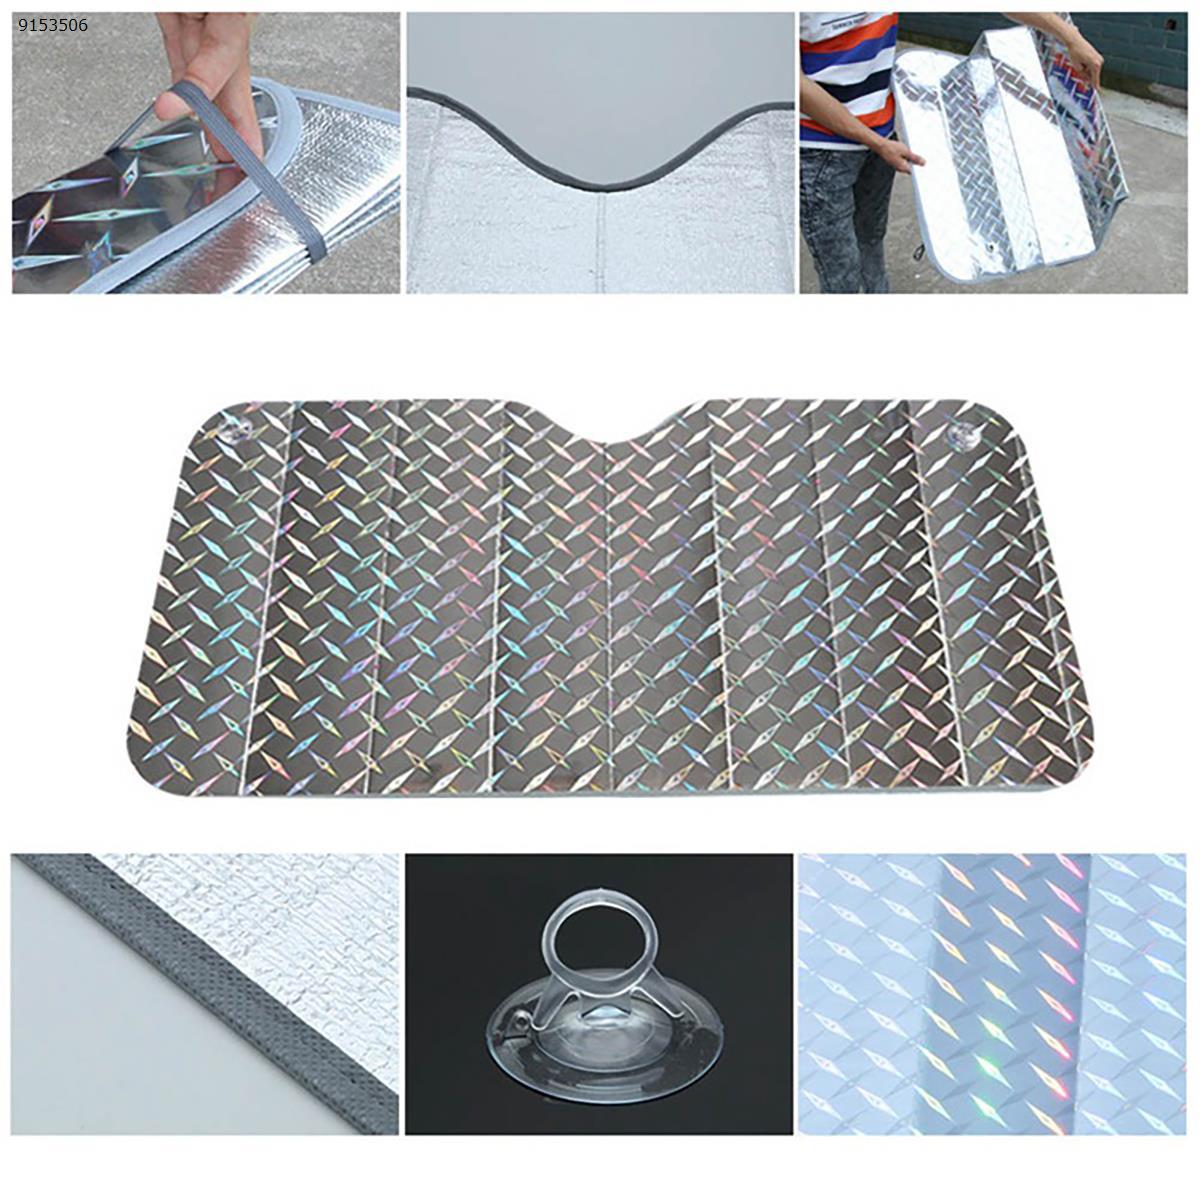 Car Fold Windshield Front Rear Window Car Styling Side Window Sunshades Accessories Supplies(130*60cm) Autocar Decorations R-3920